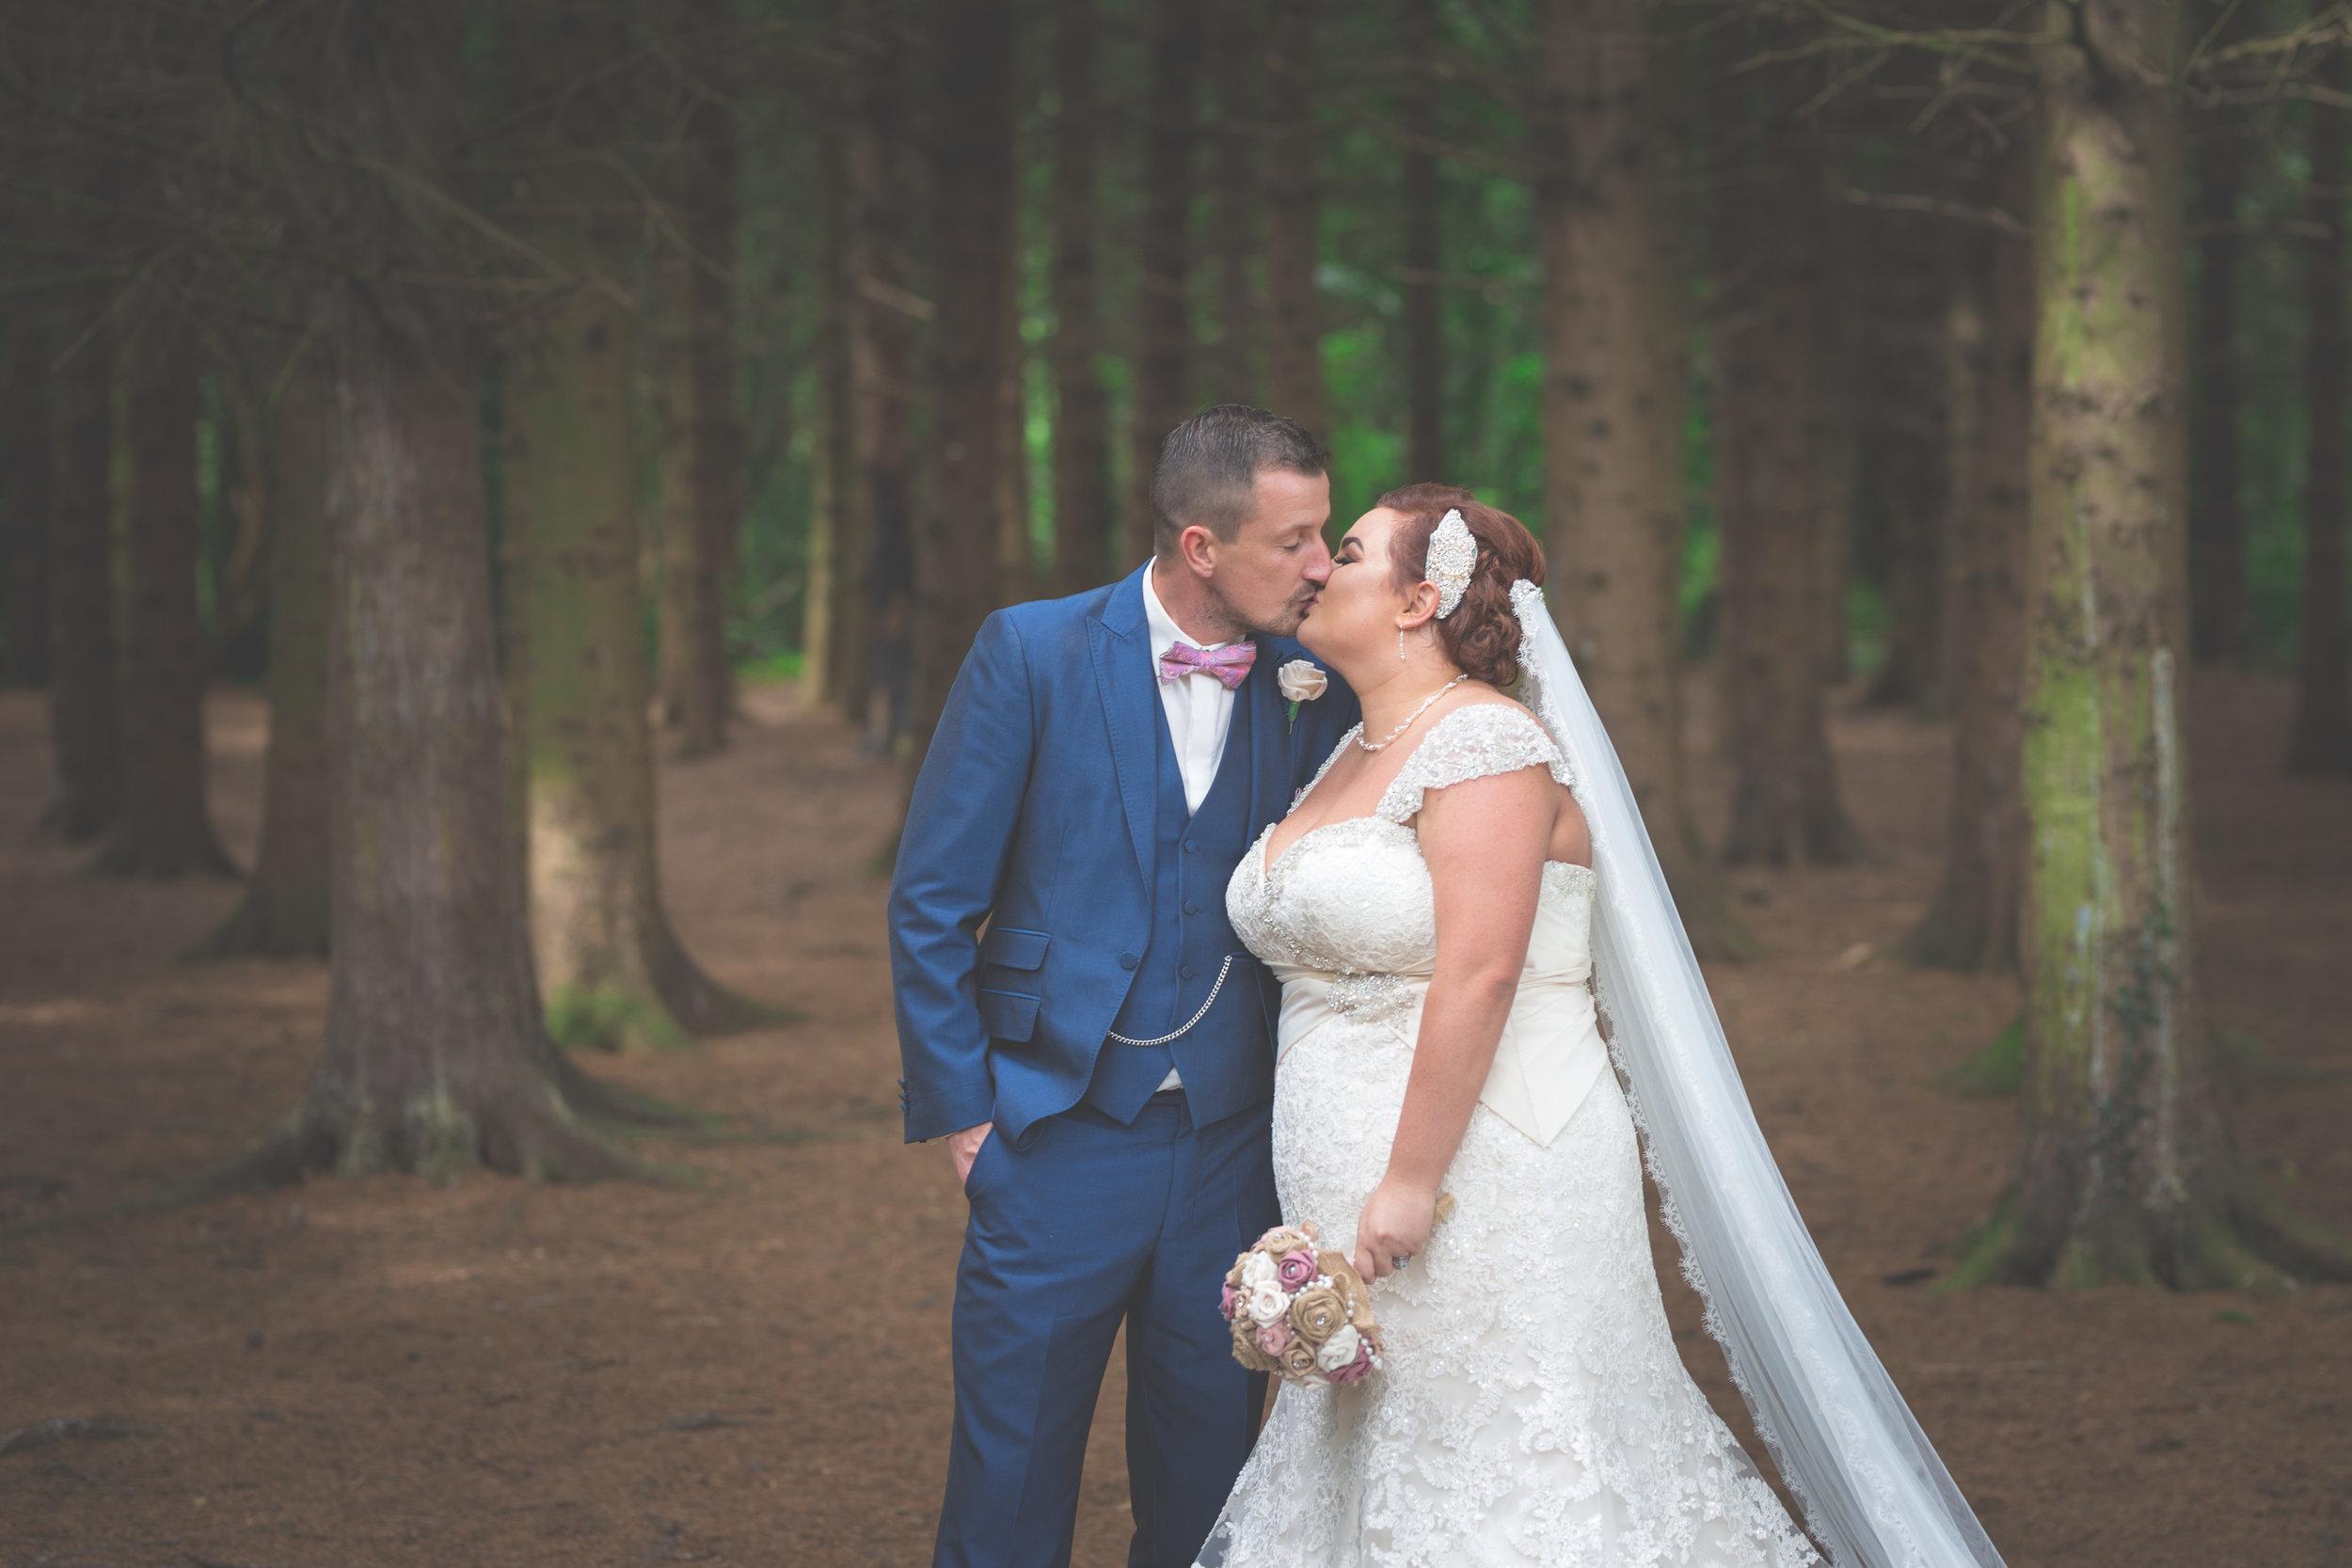 Antoinette & Stephen - Portraits   Brian McEwan Photography   Wedding Photographer Northern Ireland 24.jpg